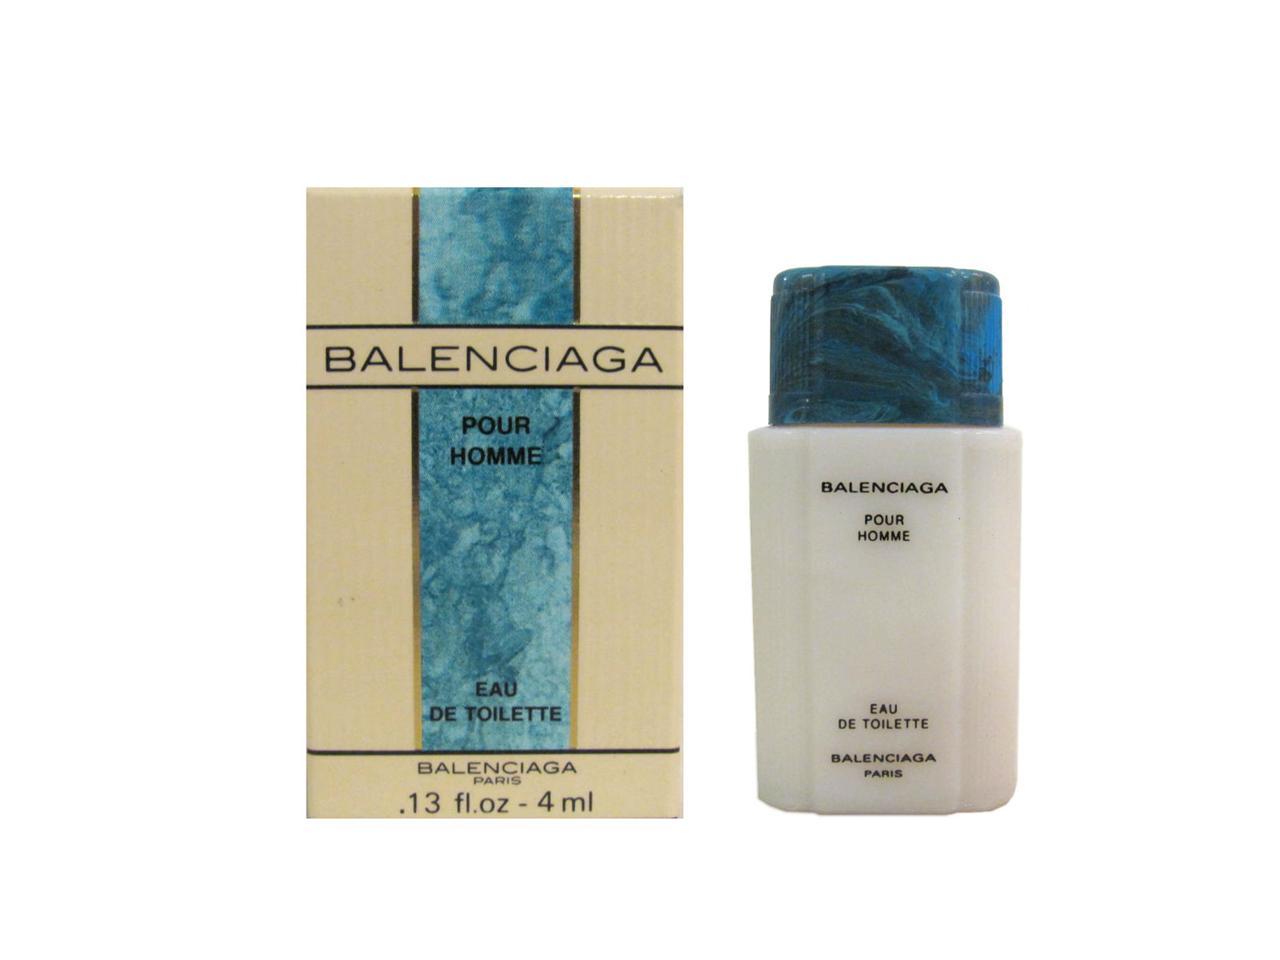 balenciaga pour homme 4 ml eau de toilette miniature nib by balenciaga ebay